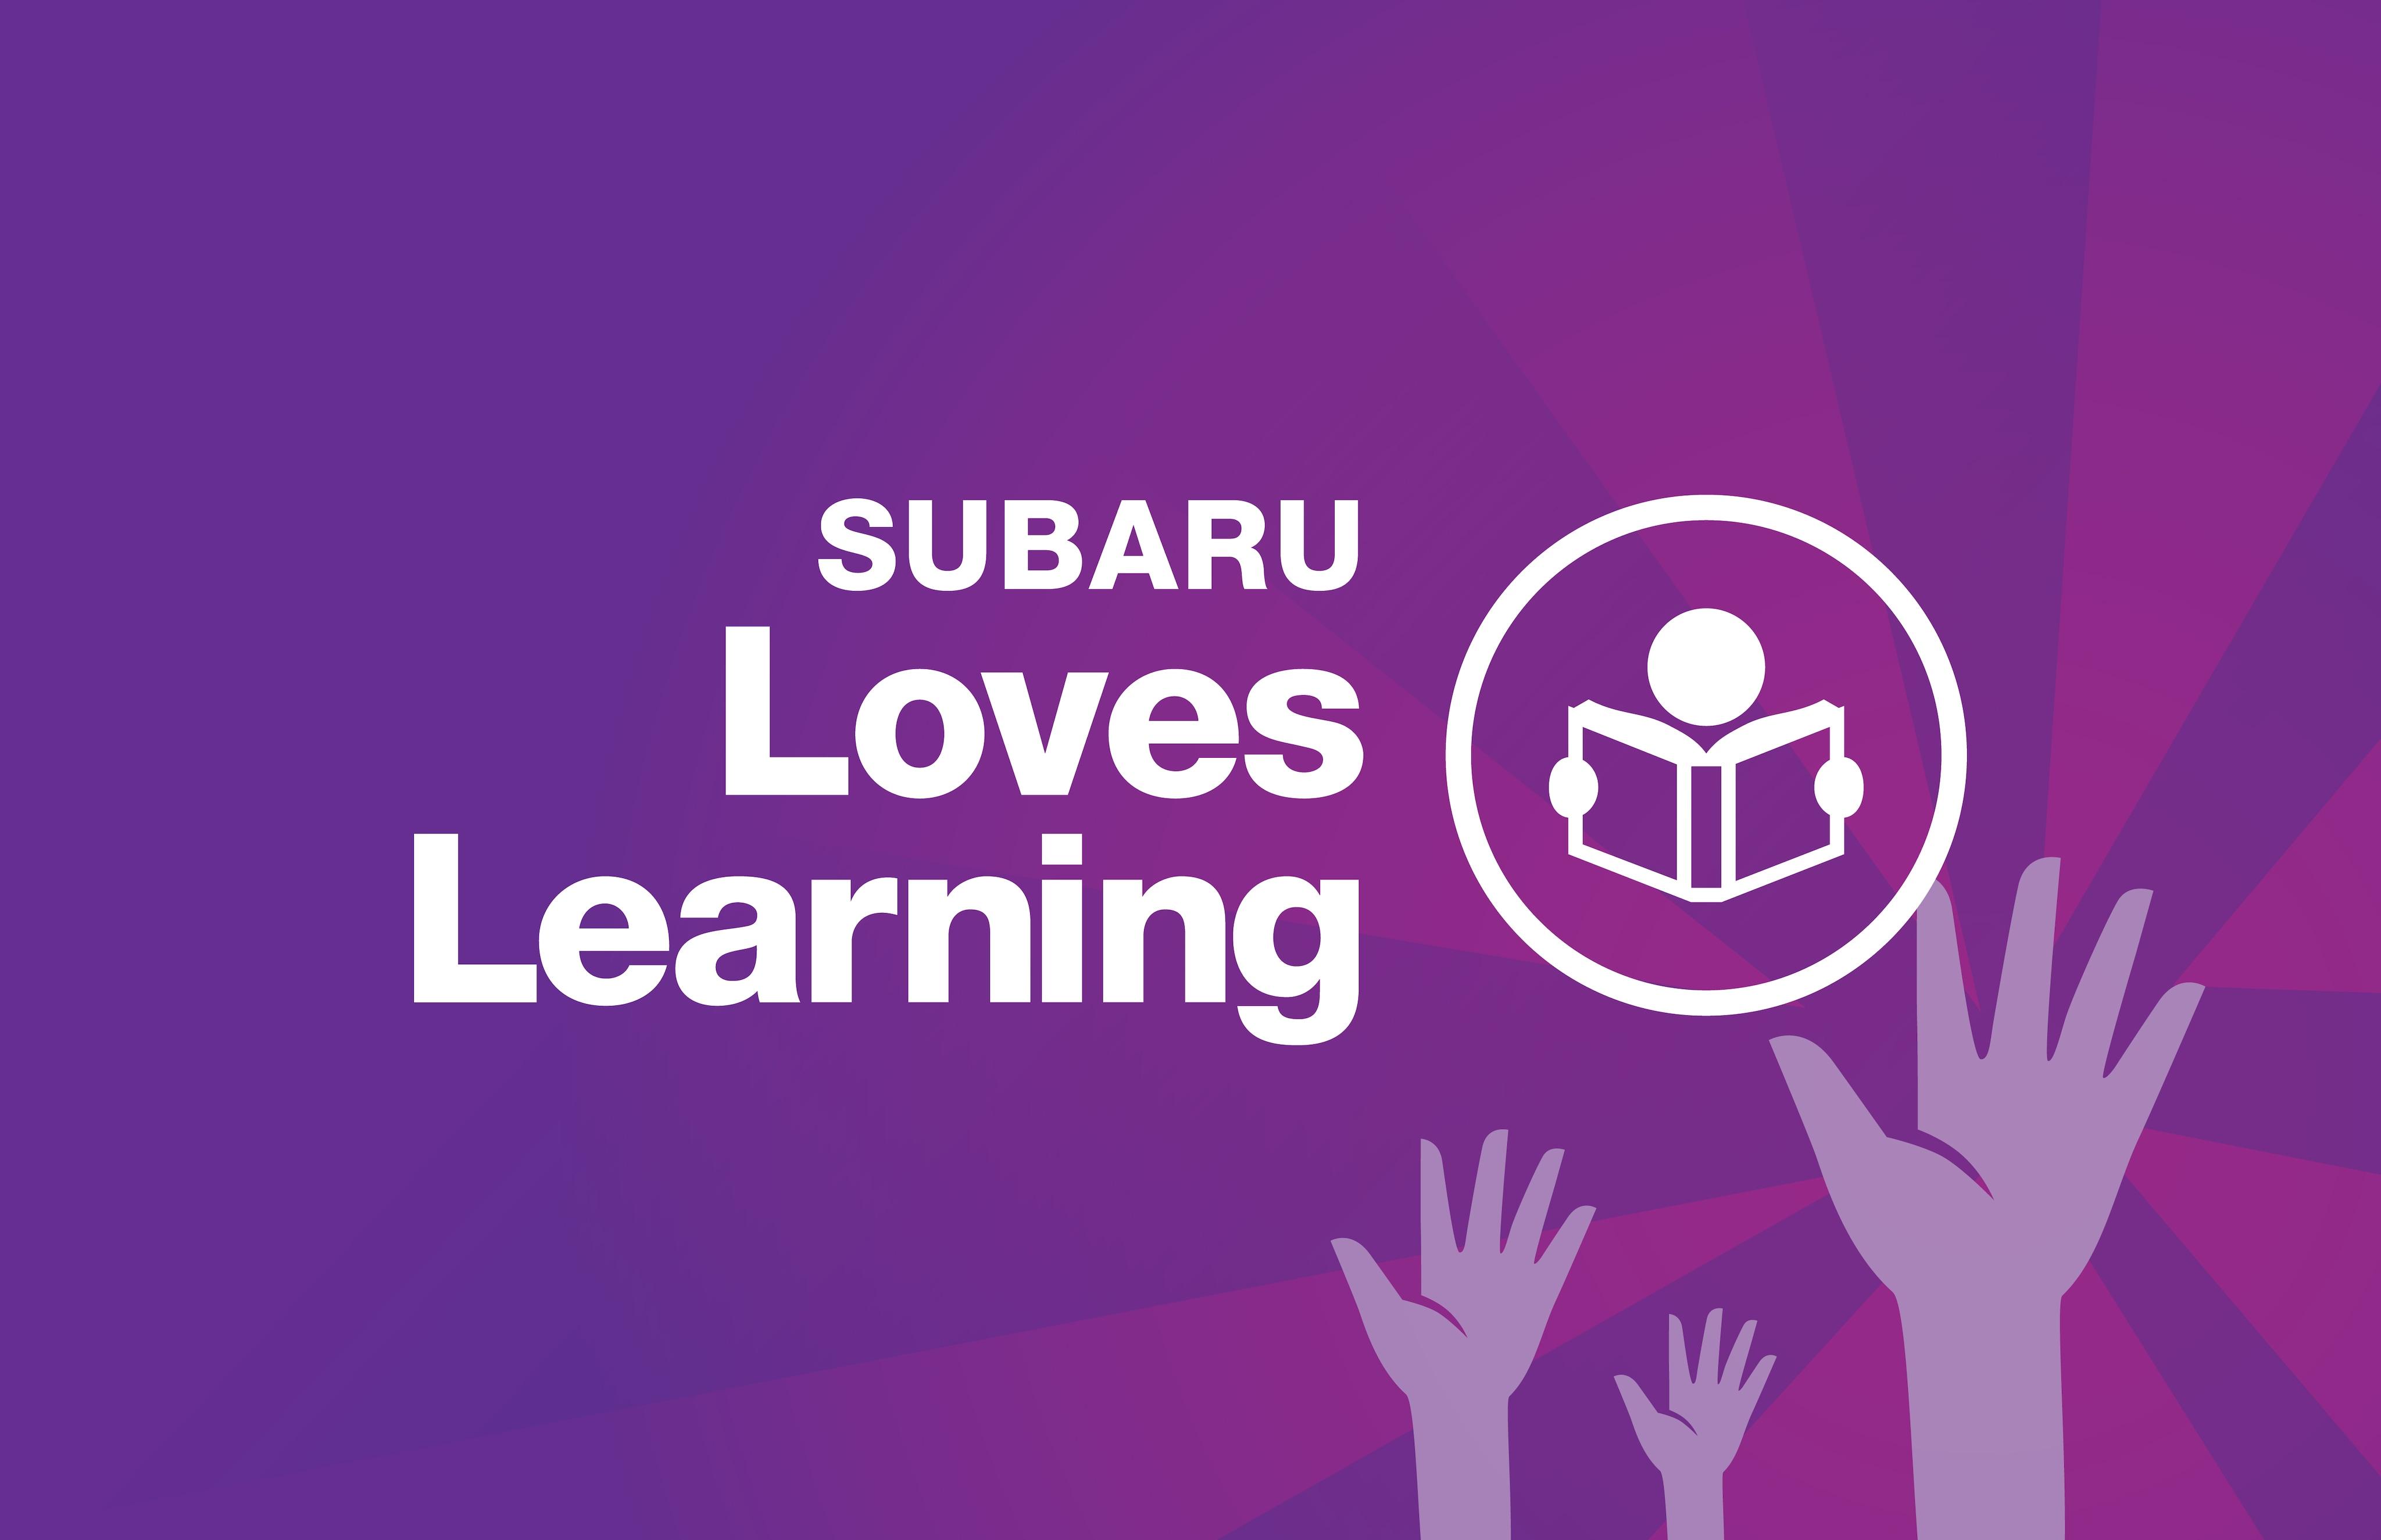 Subaru Loves Learning